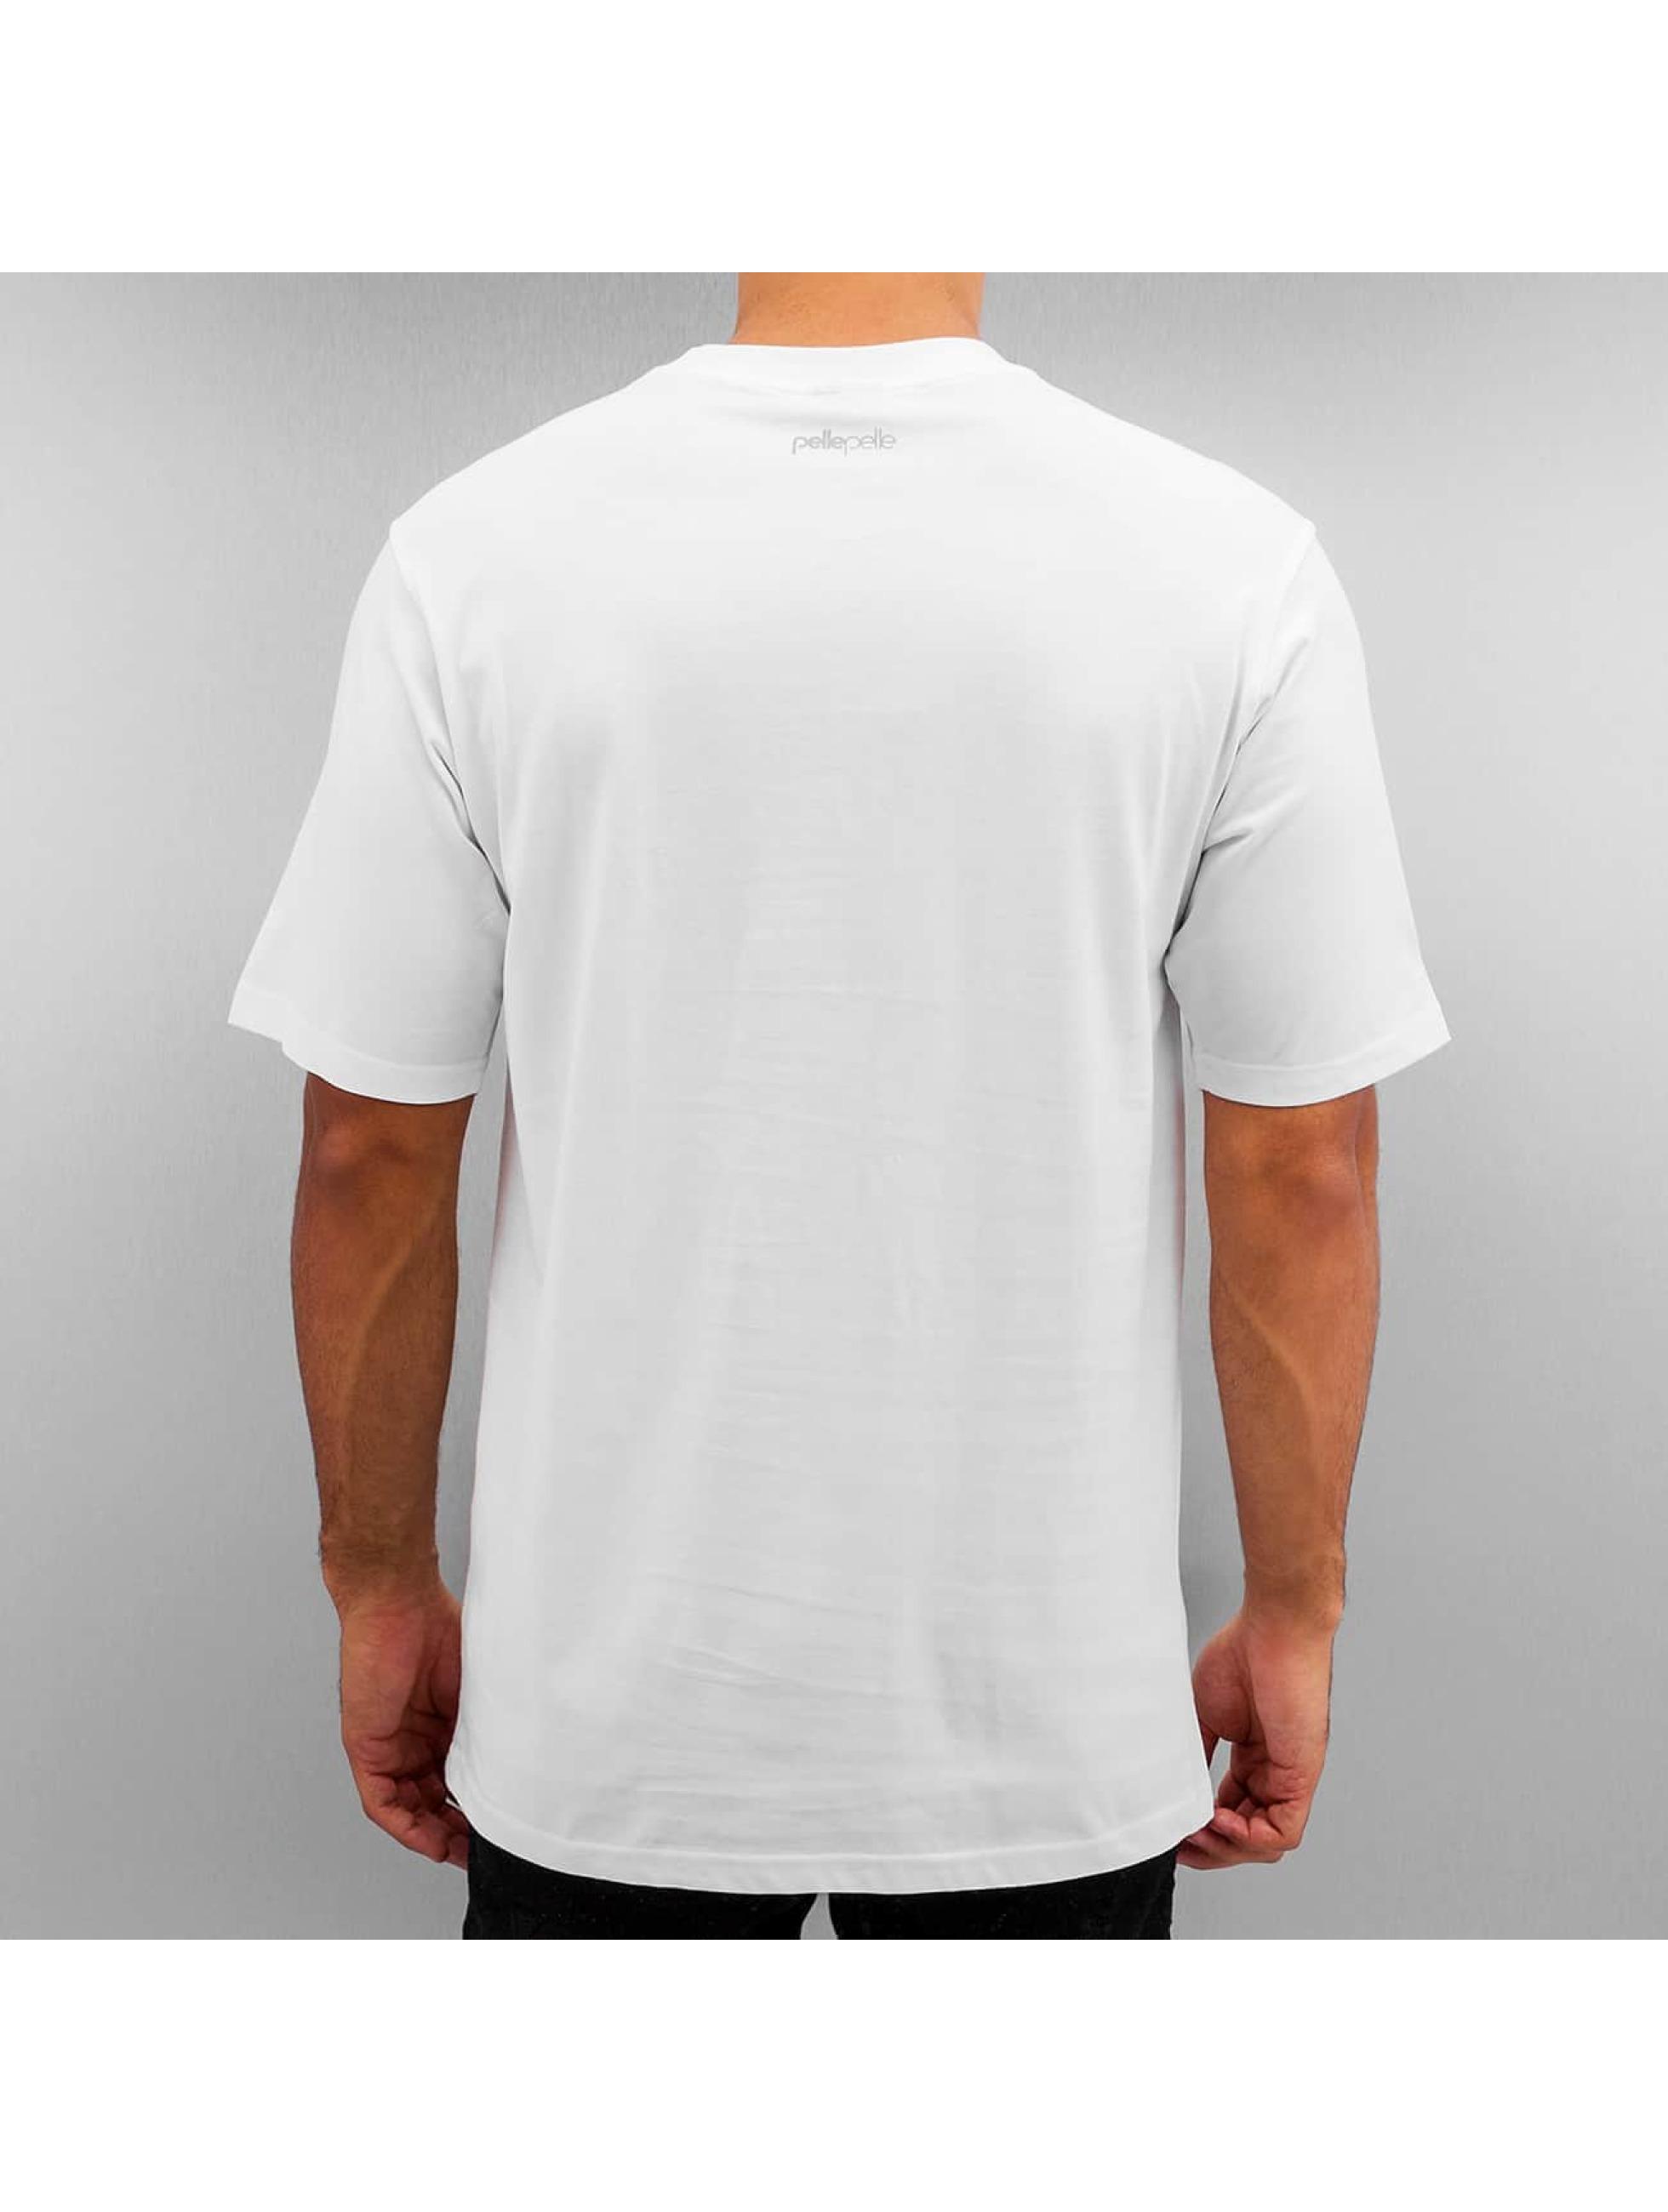 Pelle Pelle T-shirts 50/50 Dark Maze hvid